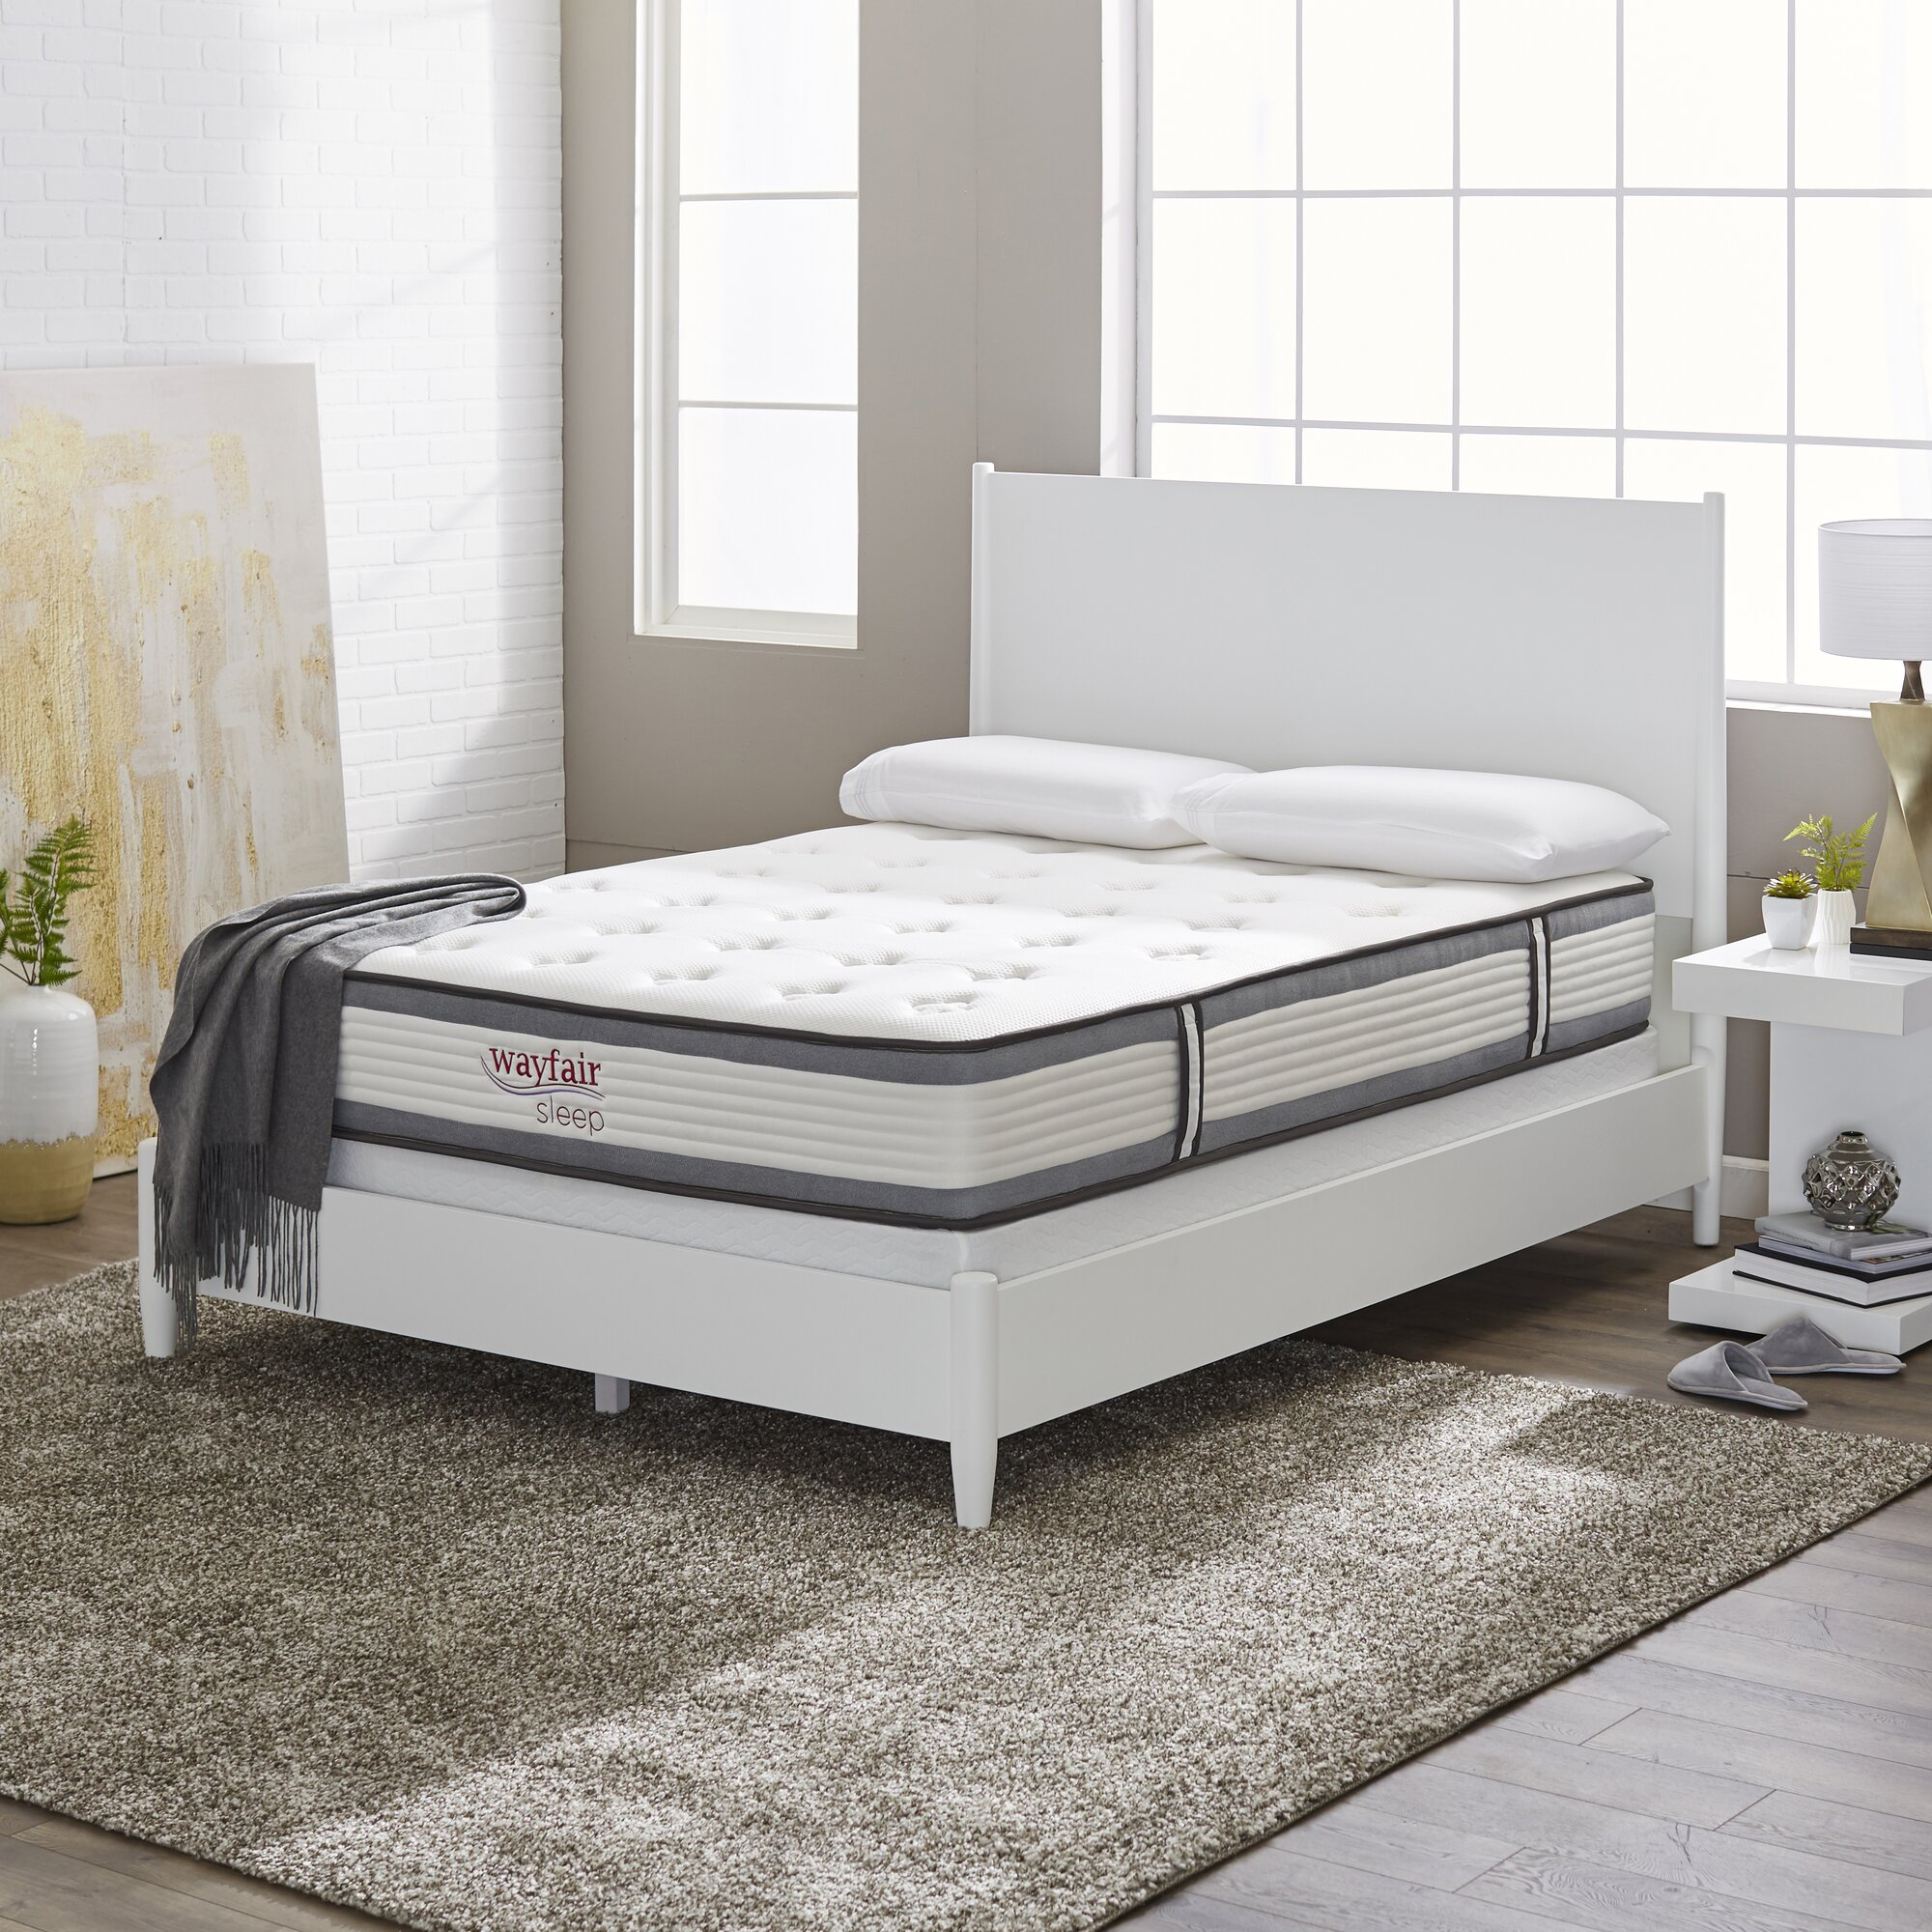 wayfair sleep wayfair sleep 10 5 plush hybrid mattress reviews wayfair. Black Bedroom Furniture Sets. Home Design Ideas